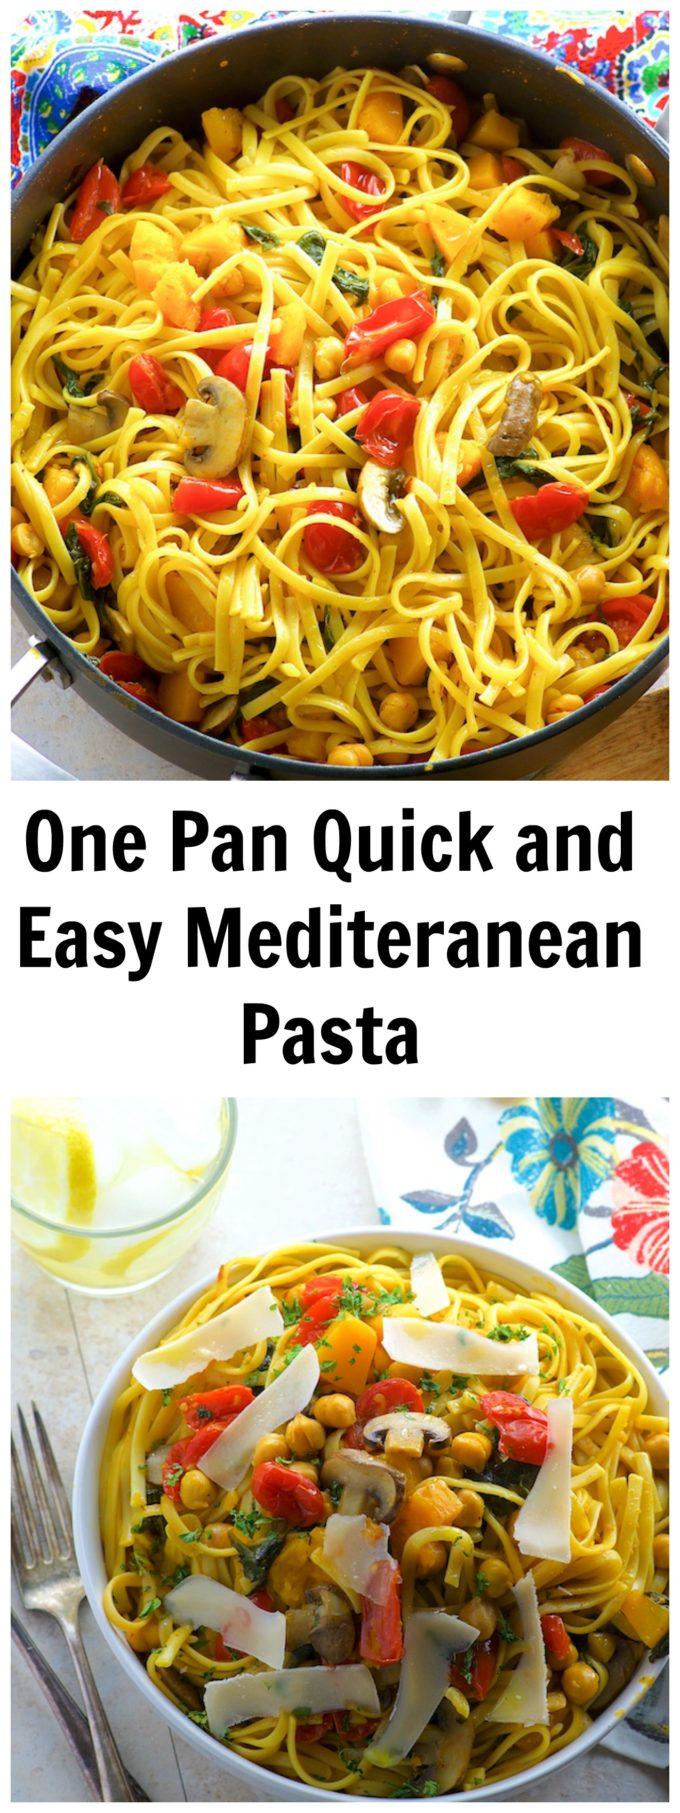 One Pot Chickpea And Butternut Squash Pasta.  #FamilyPastaTime @BarillaUS